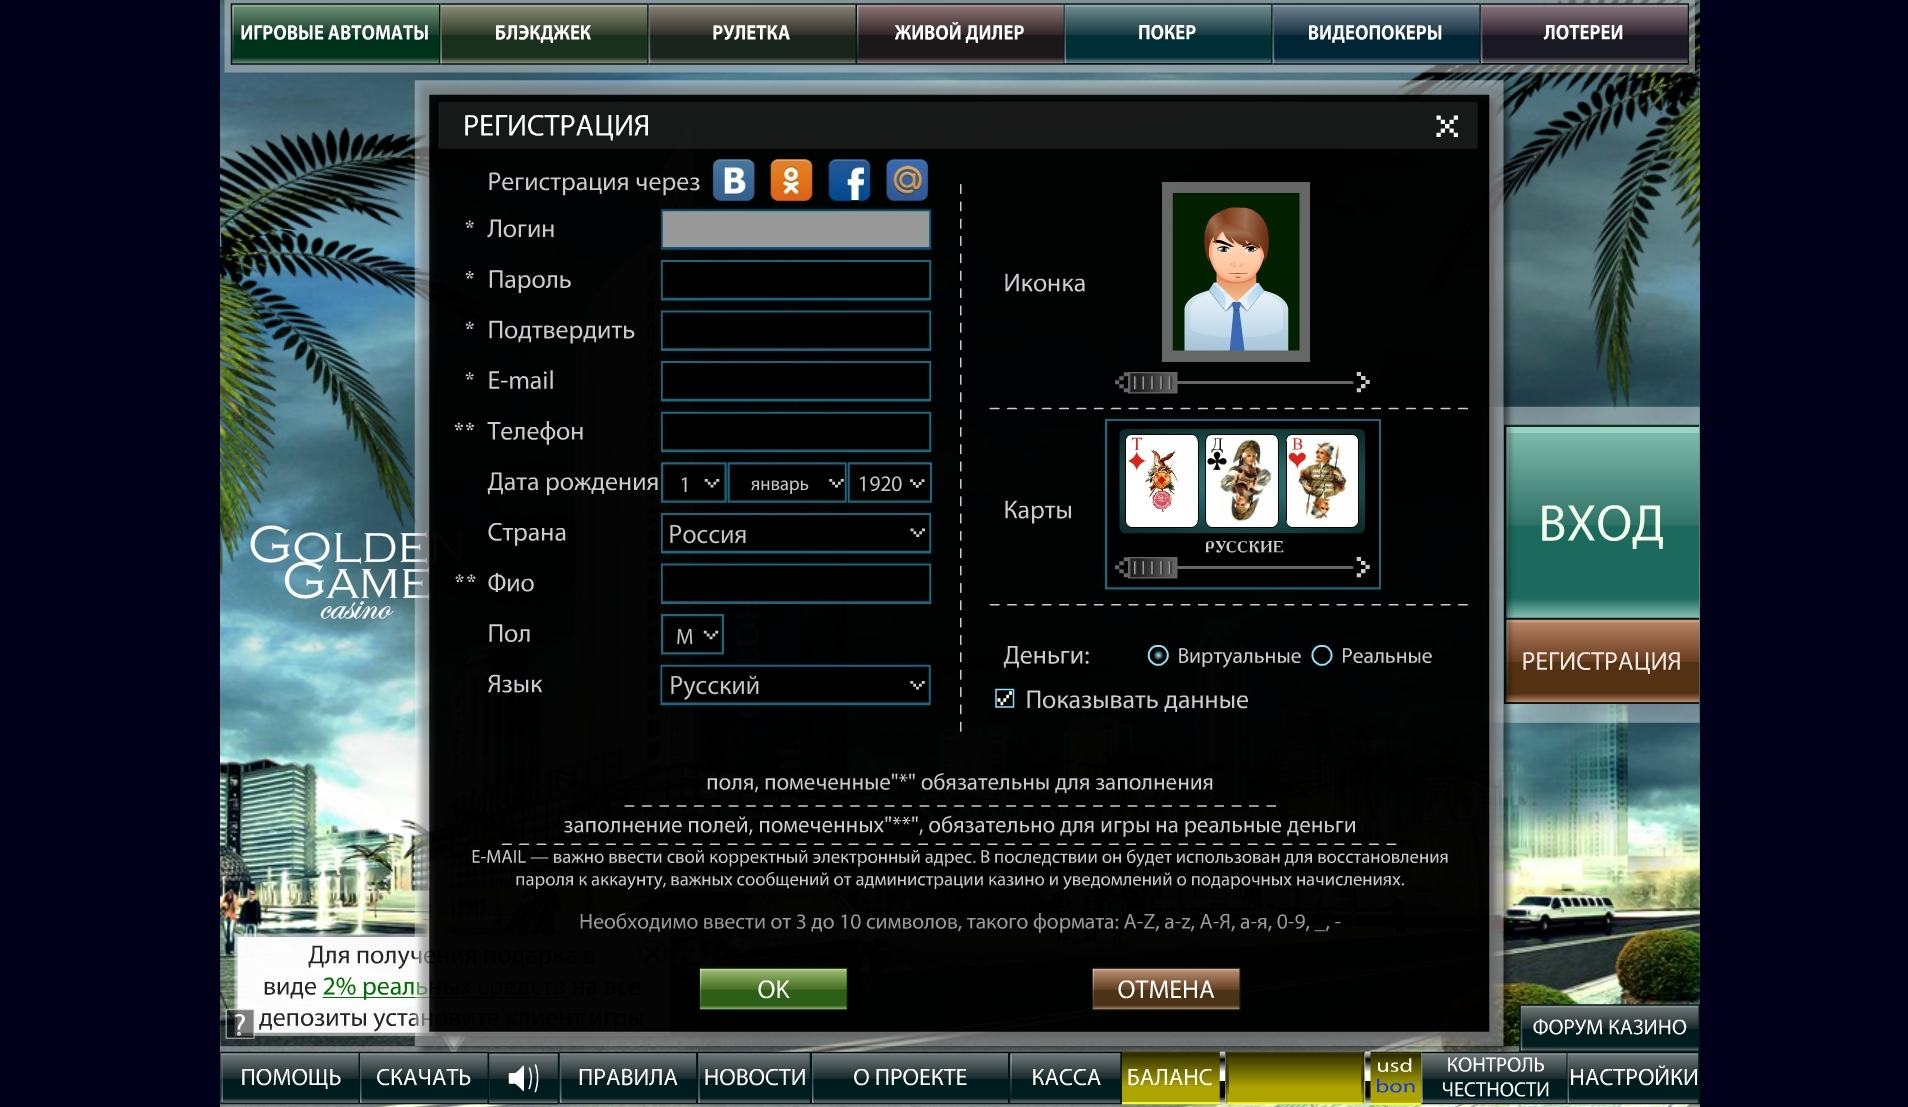 best payout online casino